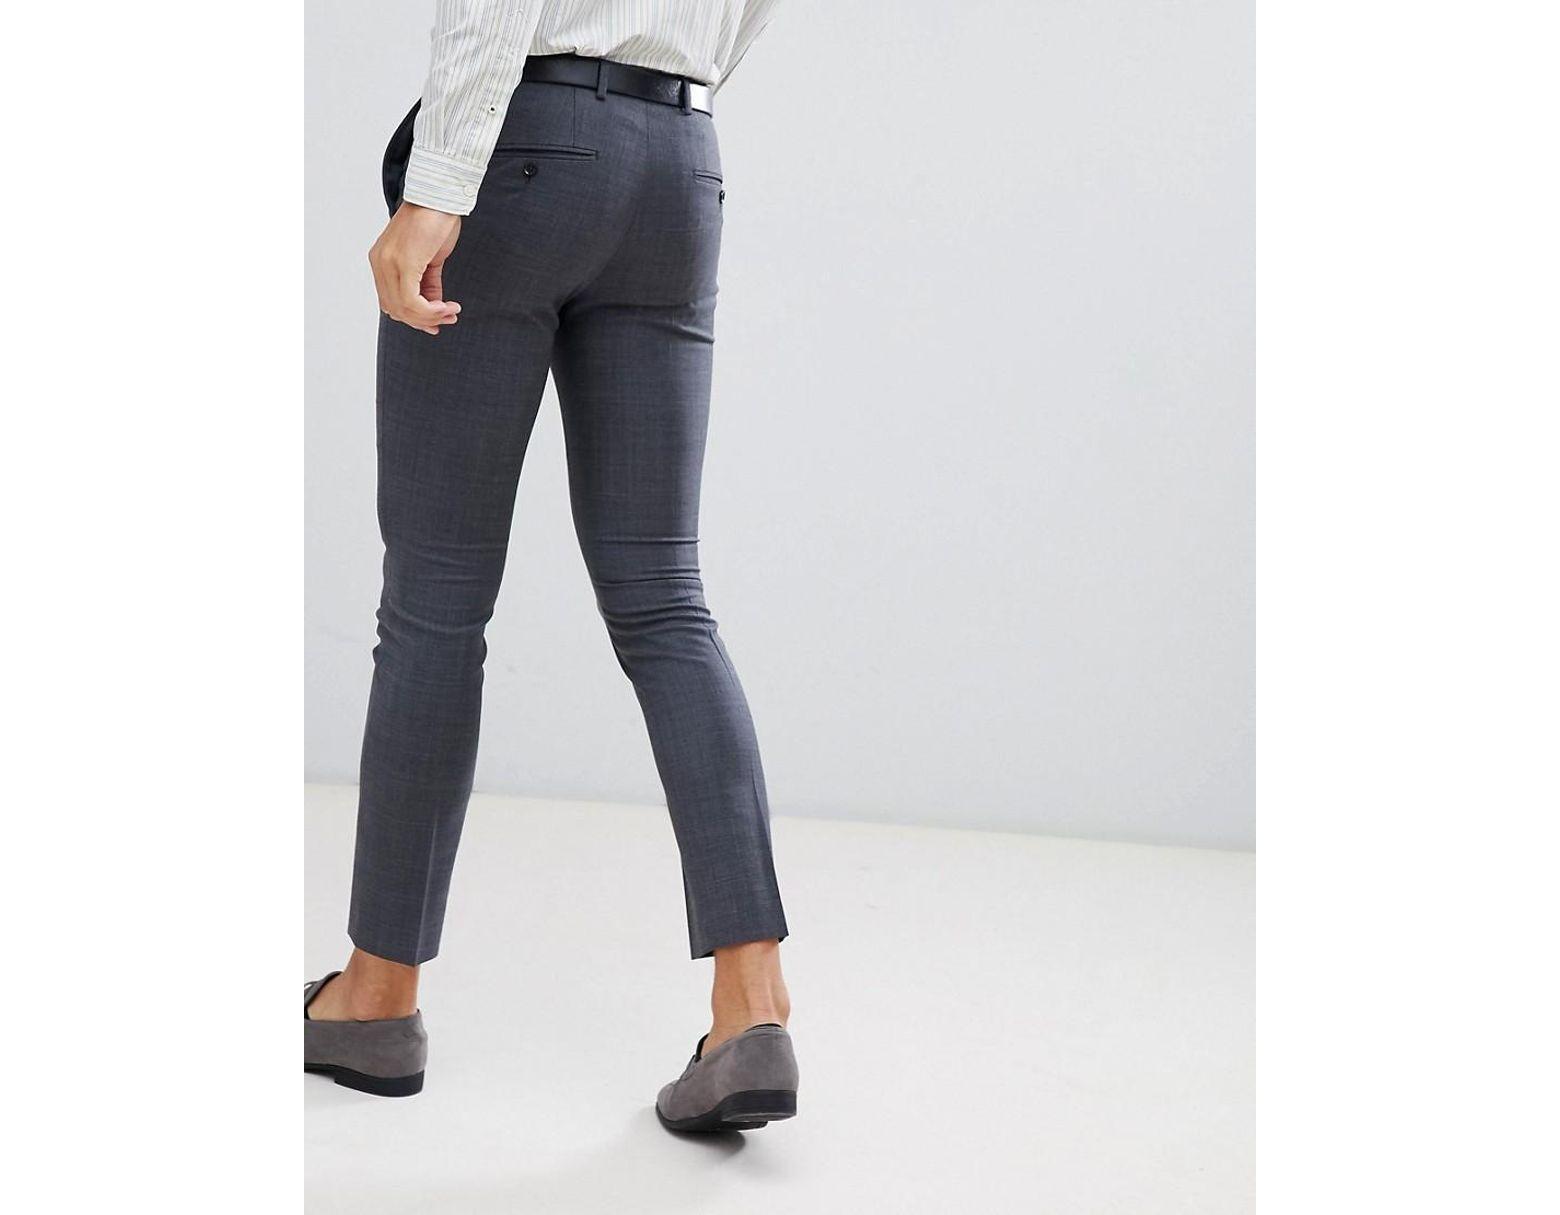 e4c9bf1d Jack & Jones Premium Super Slim Fit Stretch Suit Pants In Gray in Gray for  Men - Lyst